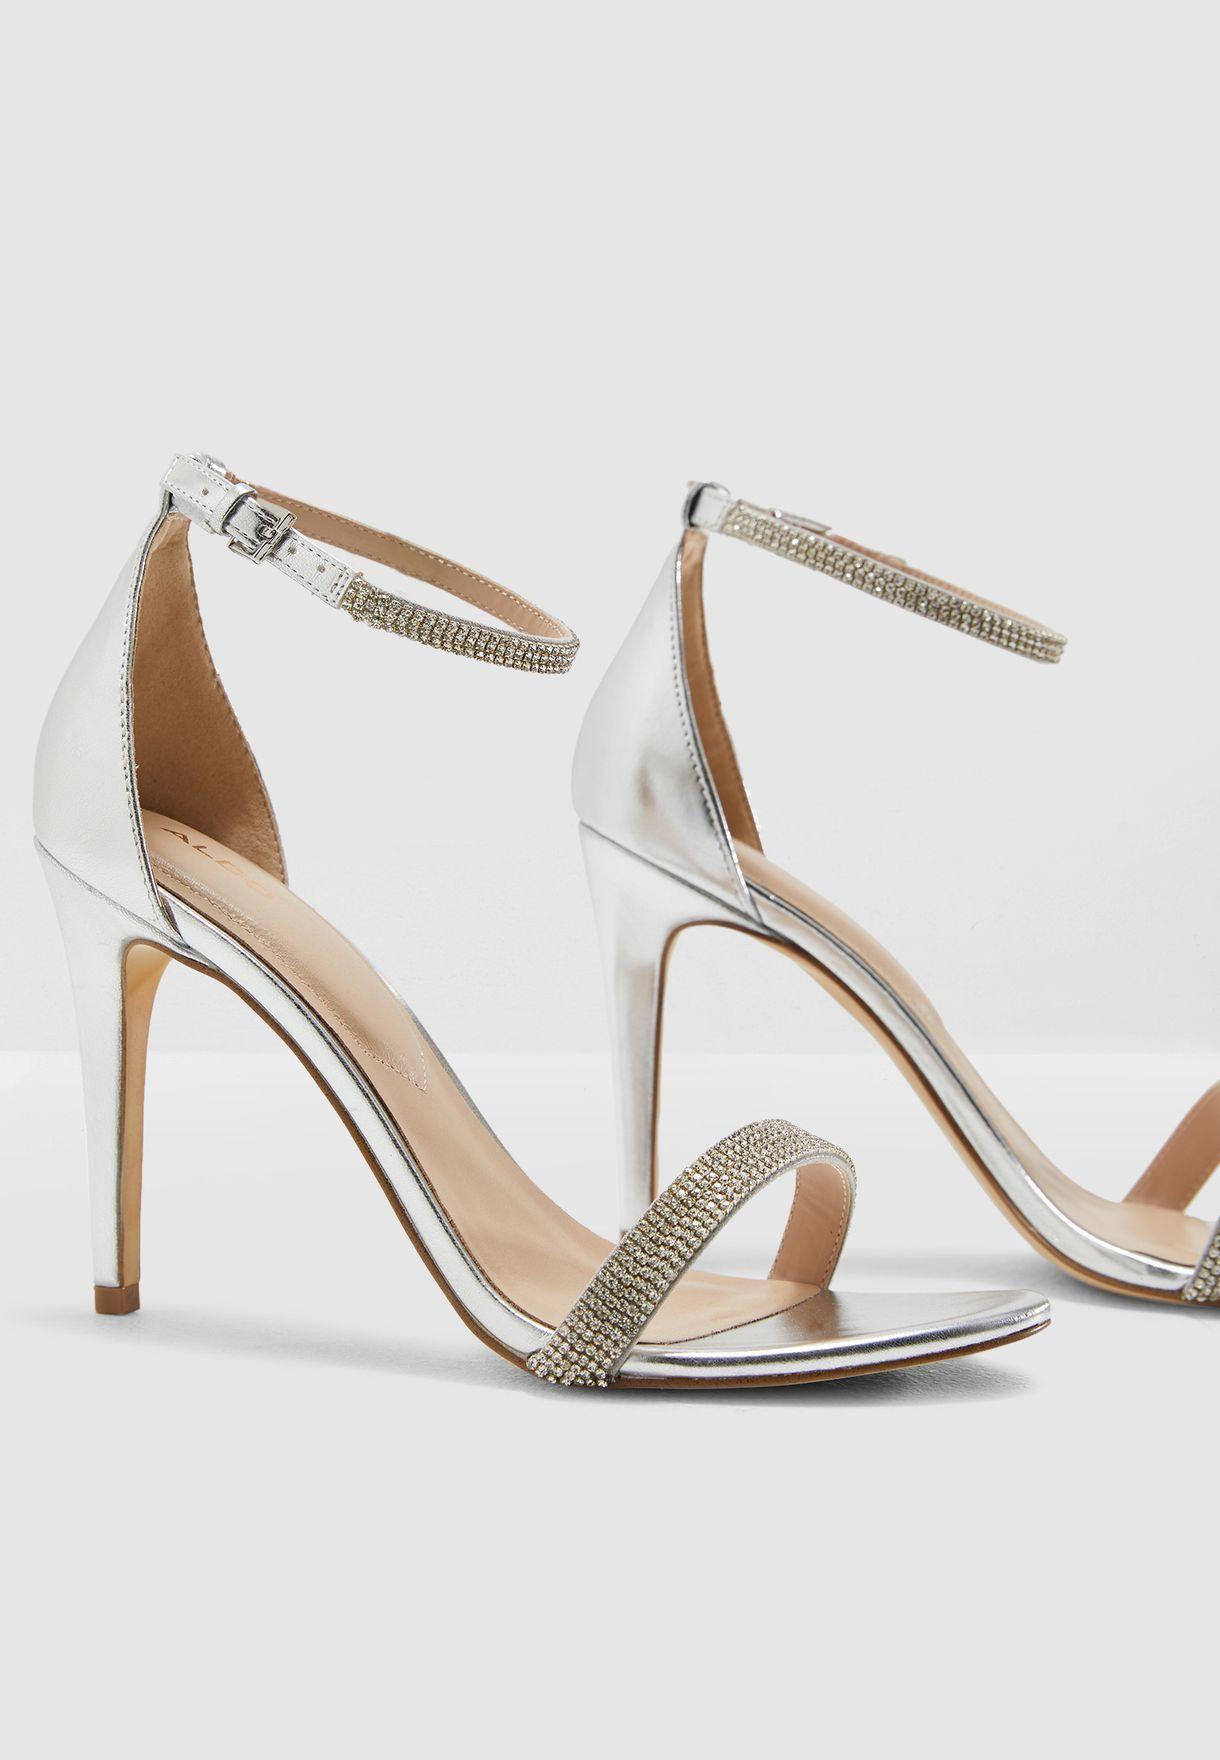 5b962da2499a Shop Aldo silver Aroclya Sandal AROCLYA81 for Women in UAE - 17704SH81DQP